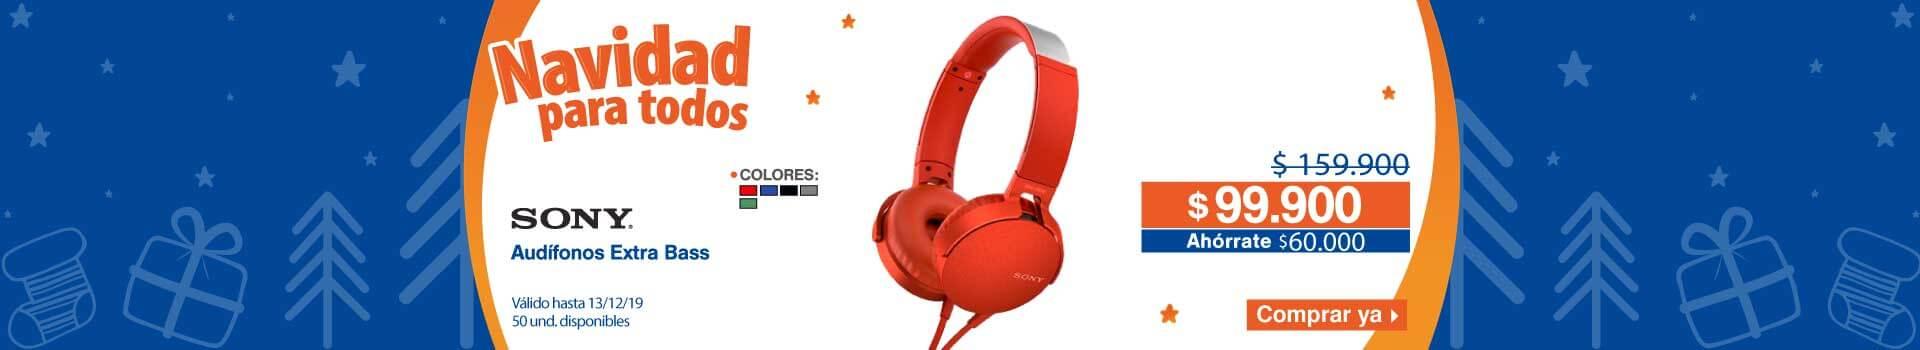 AK-ACCESORIOS-SONY-AUDIFONOS-HIPER2-DIC7